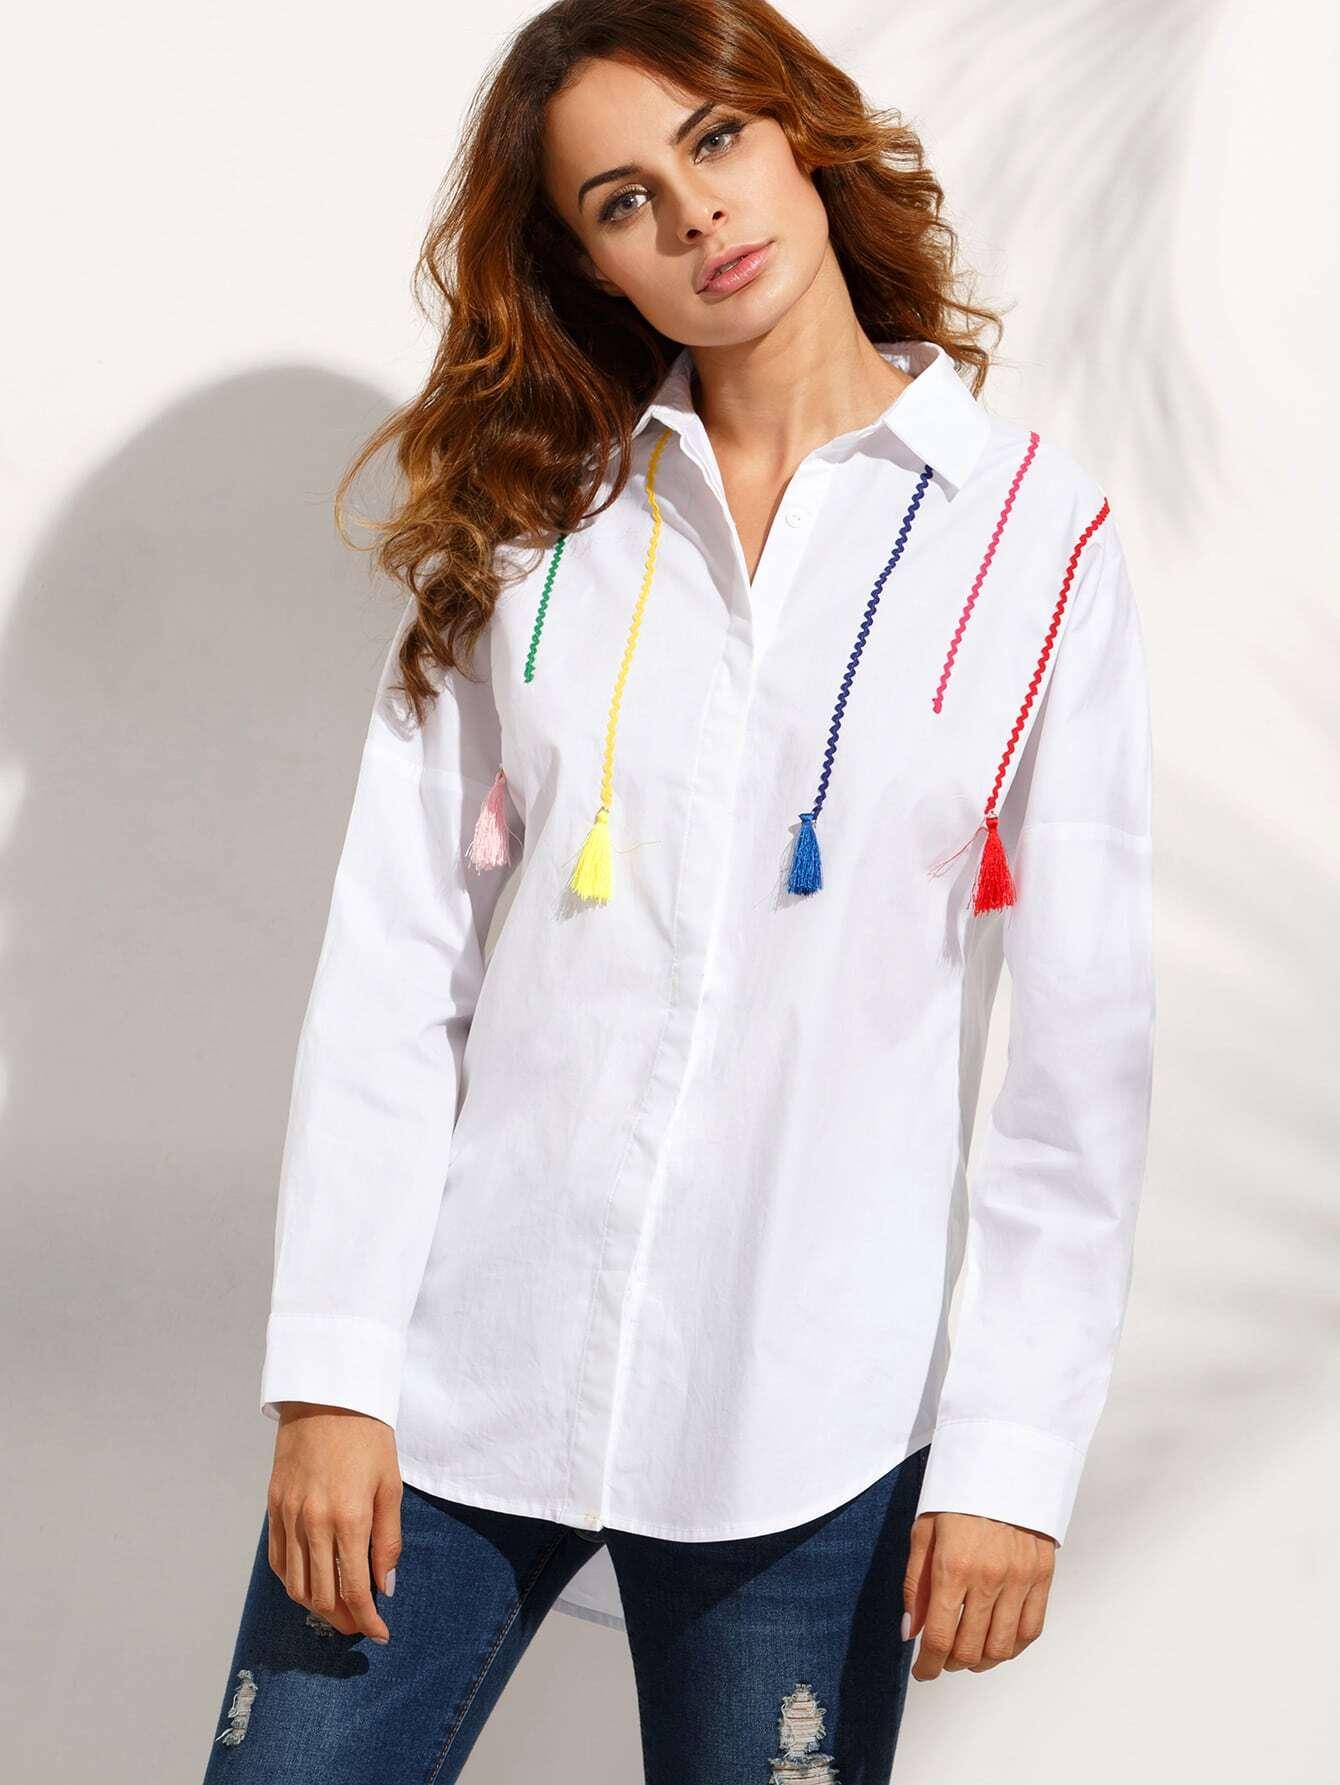 blouse160803509_2